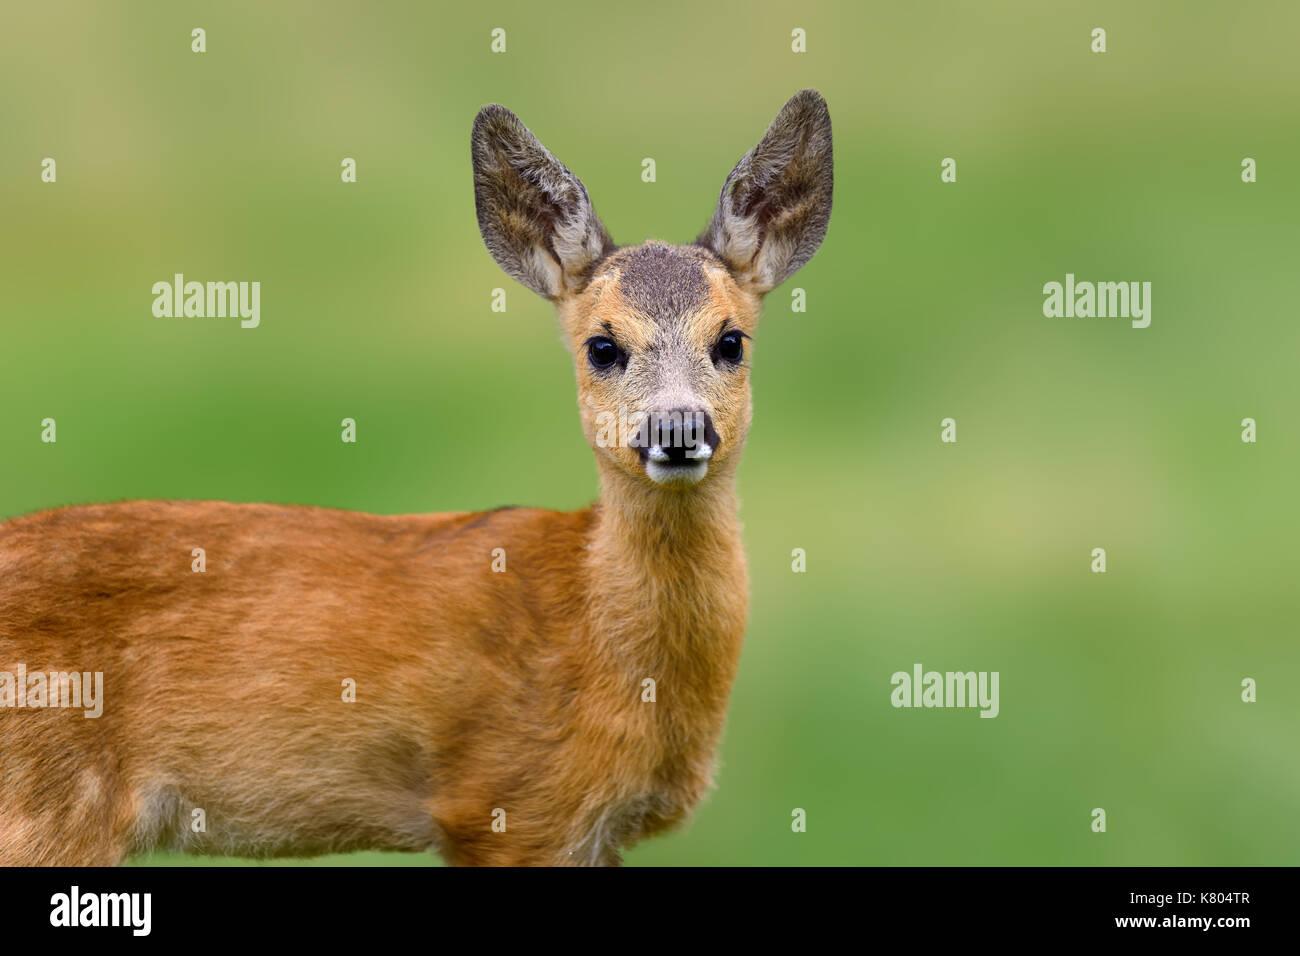 Roe deer, Capreolus capreolus, Animal in grass. Spring in the nature. Summer deer on field. - Stock Image